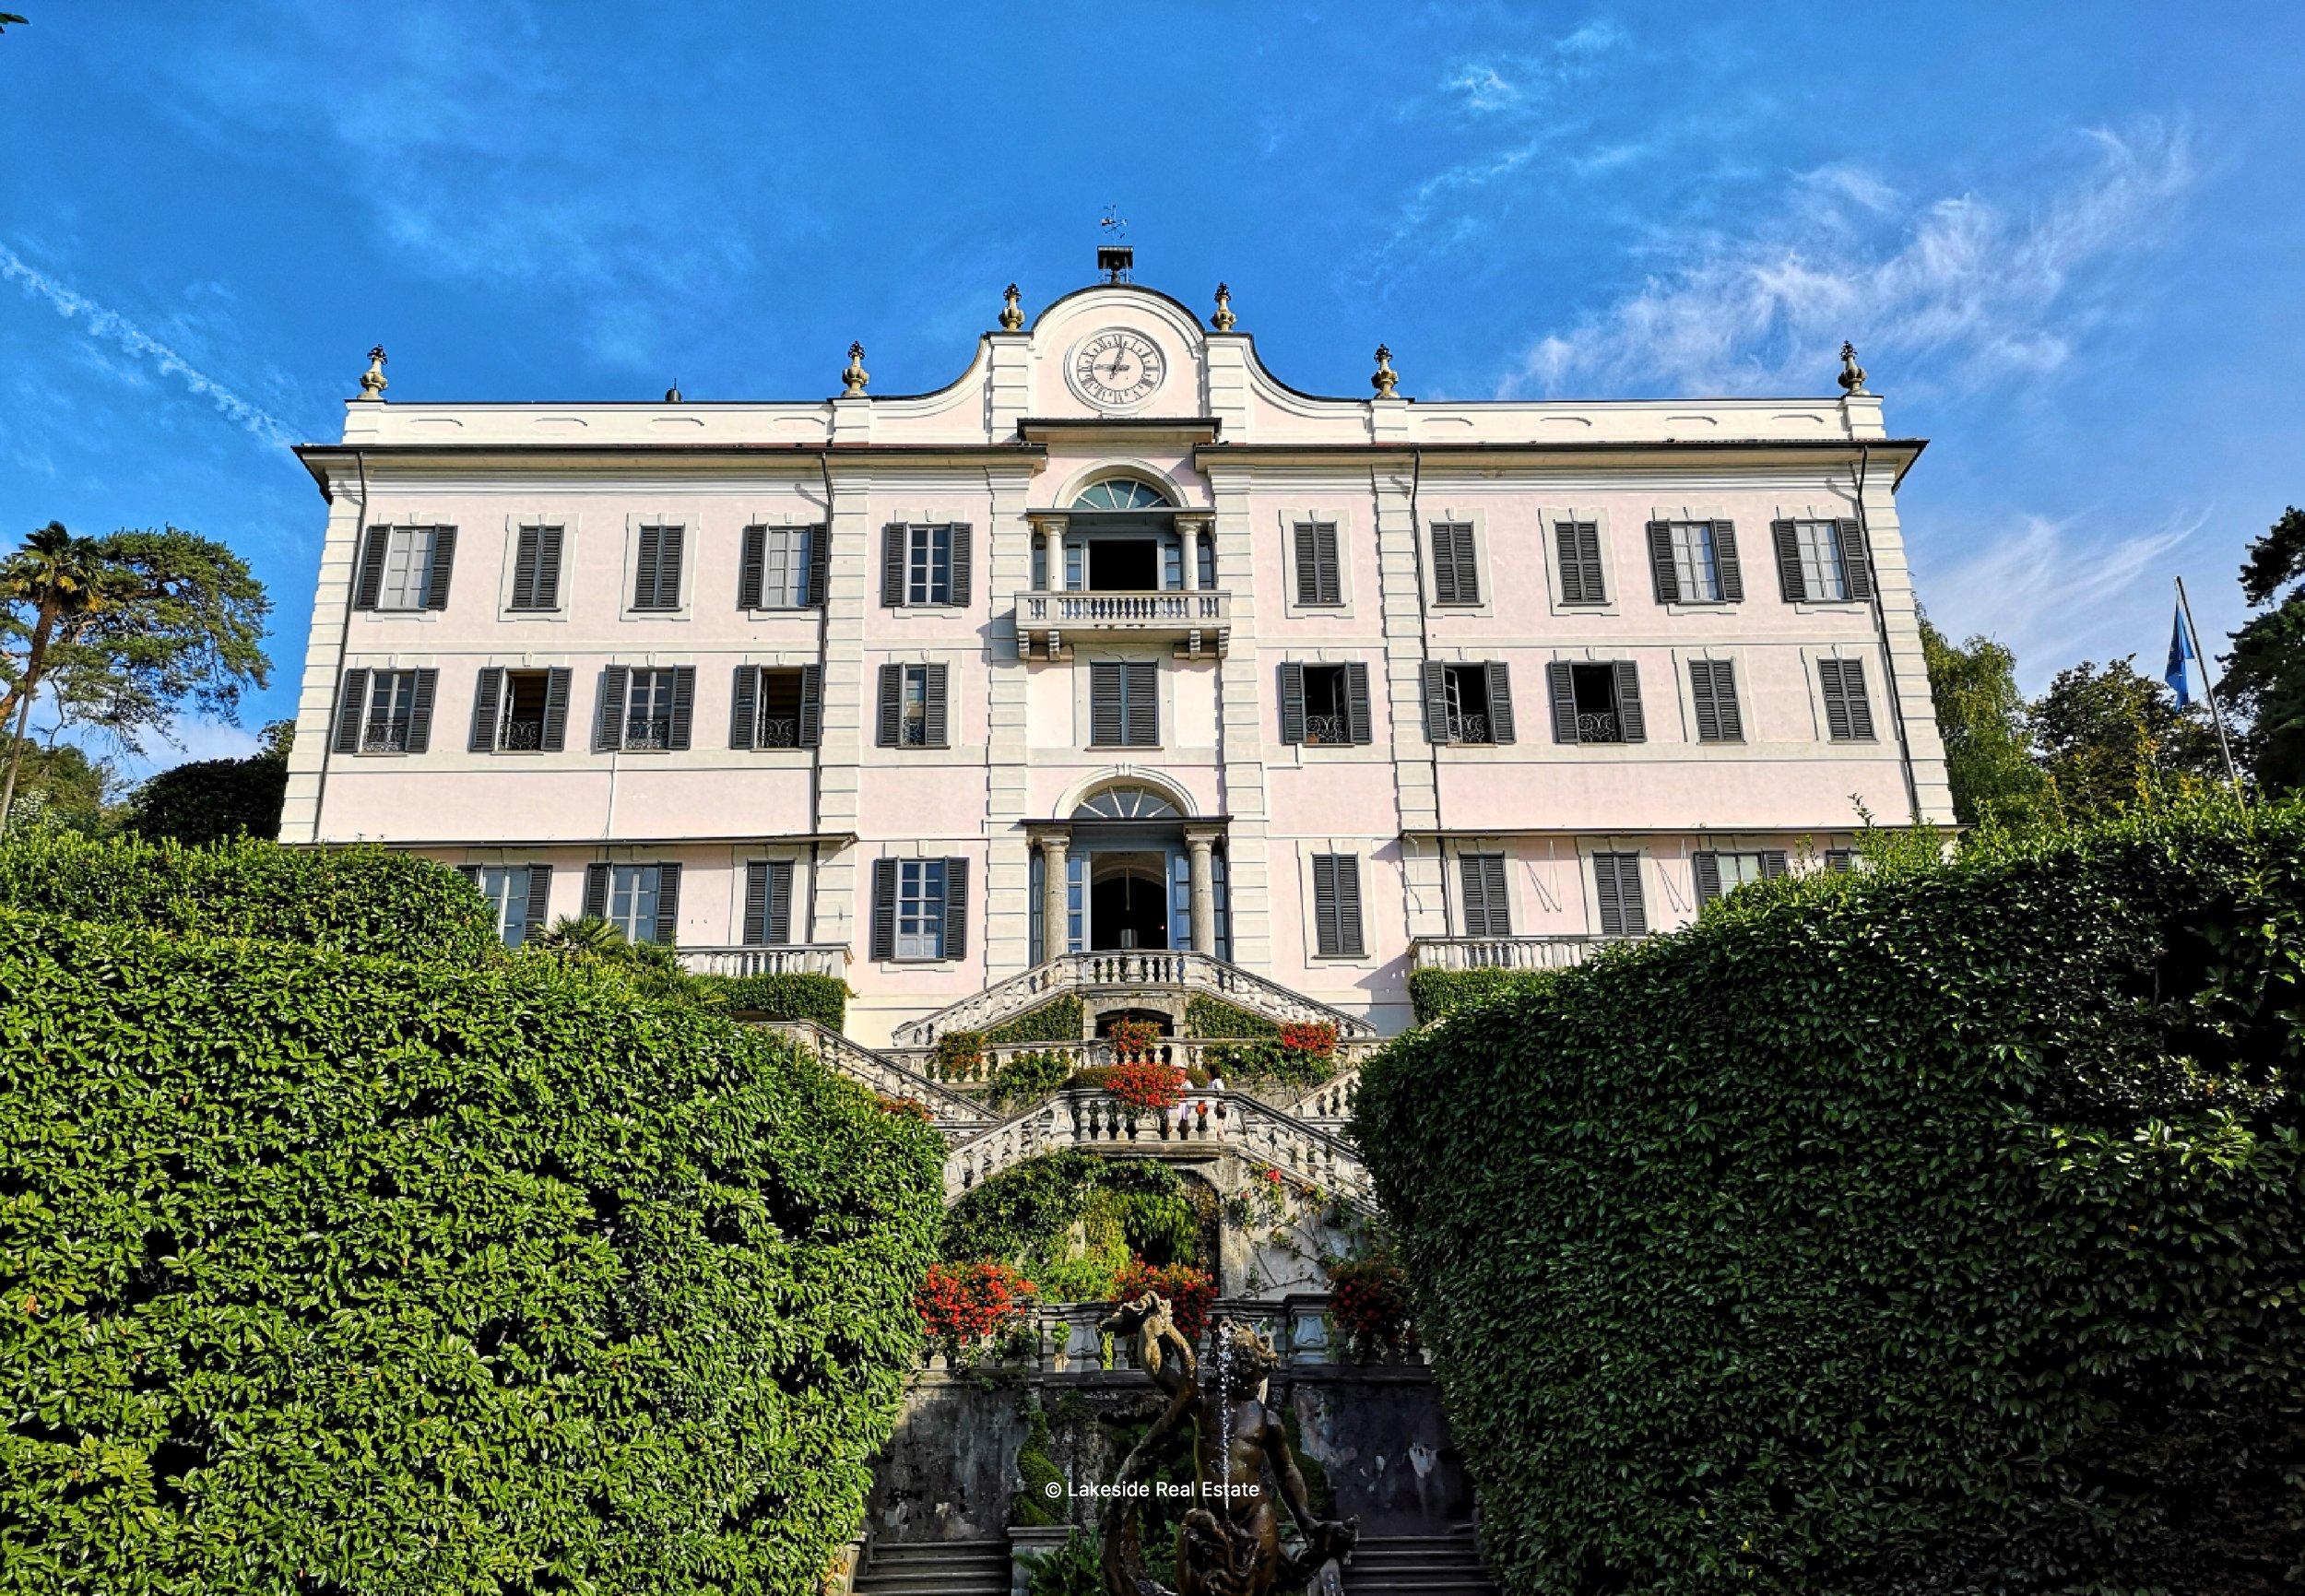 villa Carlotta lake como greenway